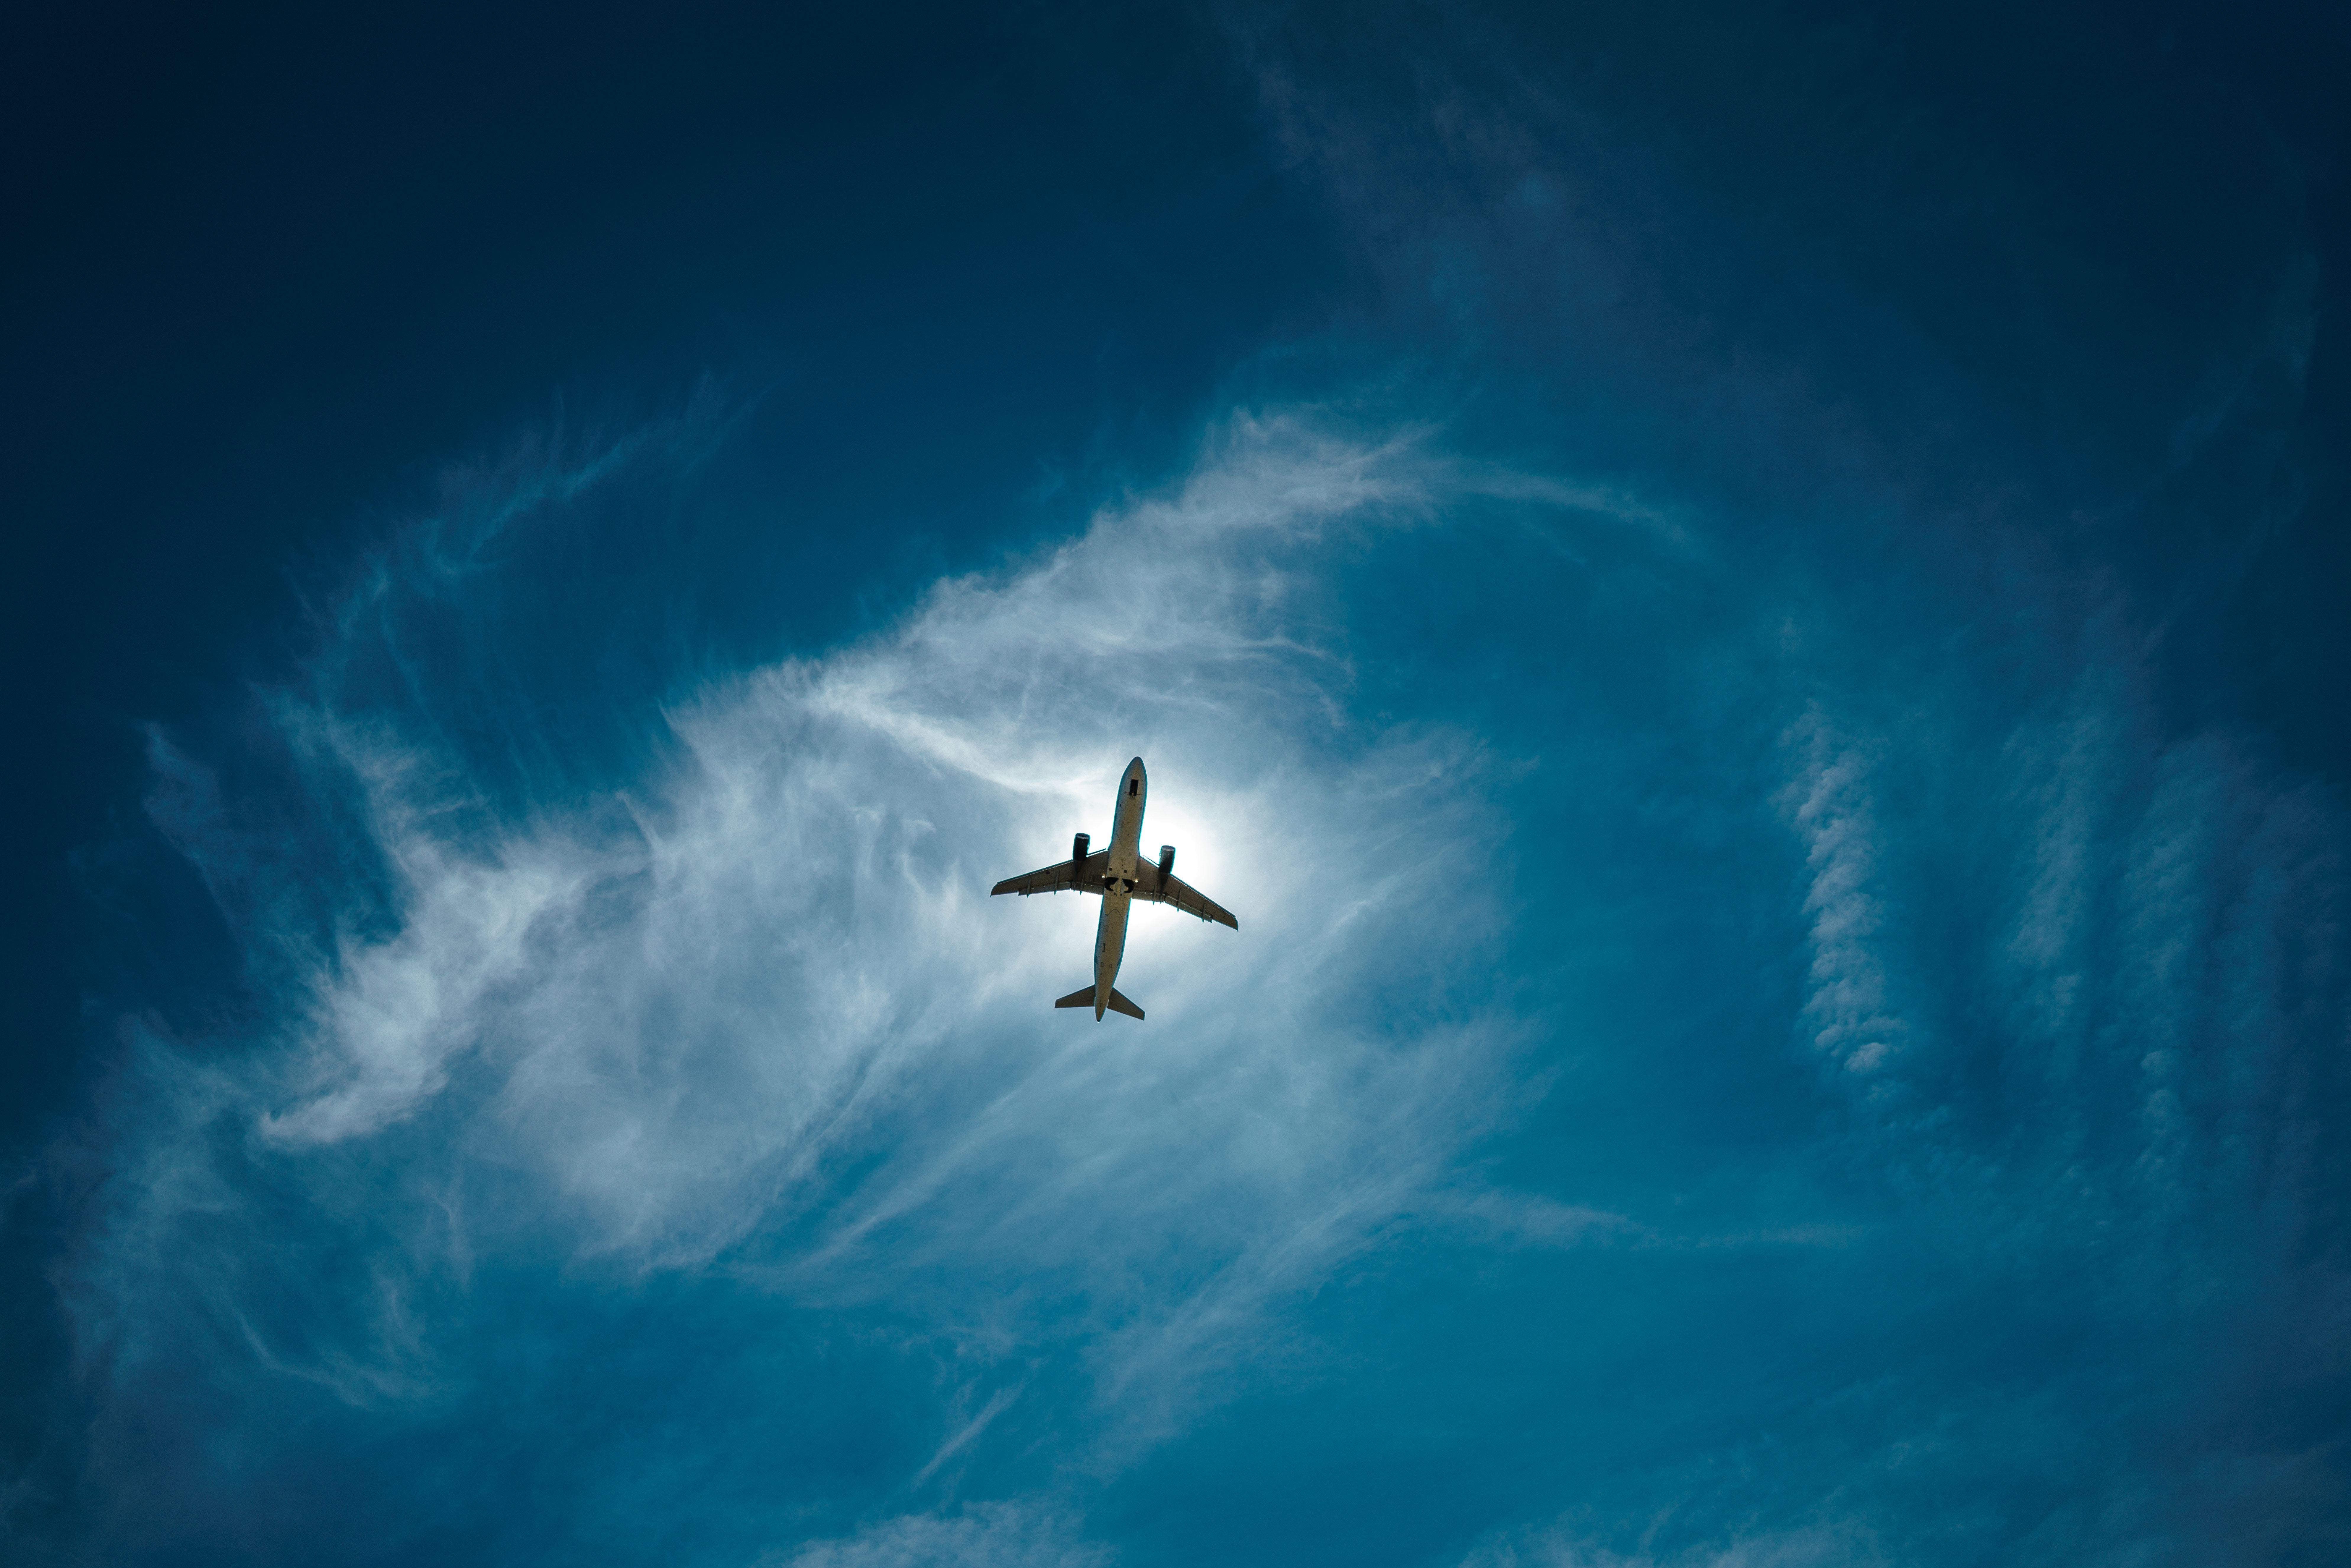 Image: Plane, flight, flying, high, skies, sky